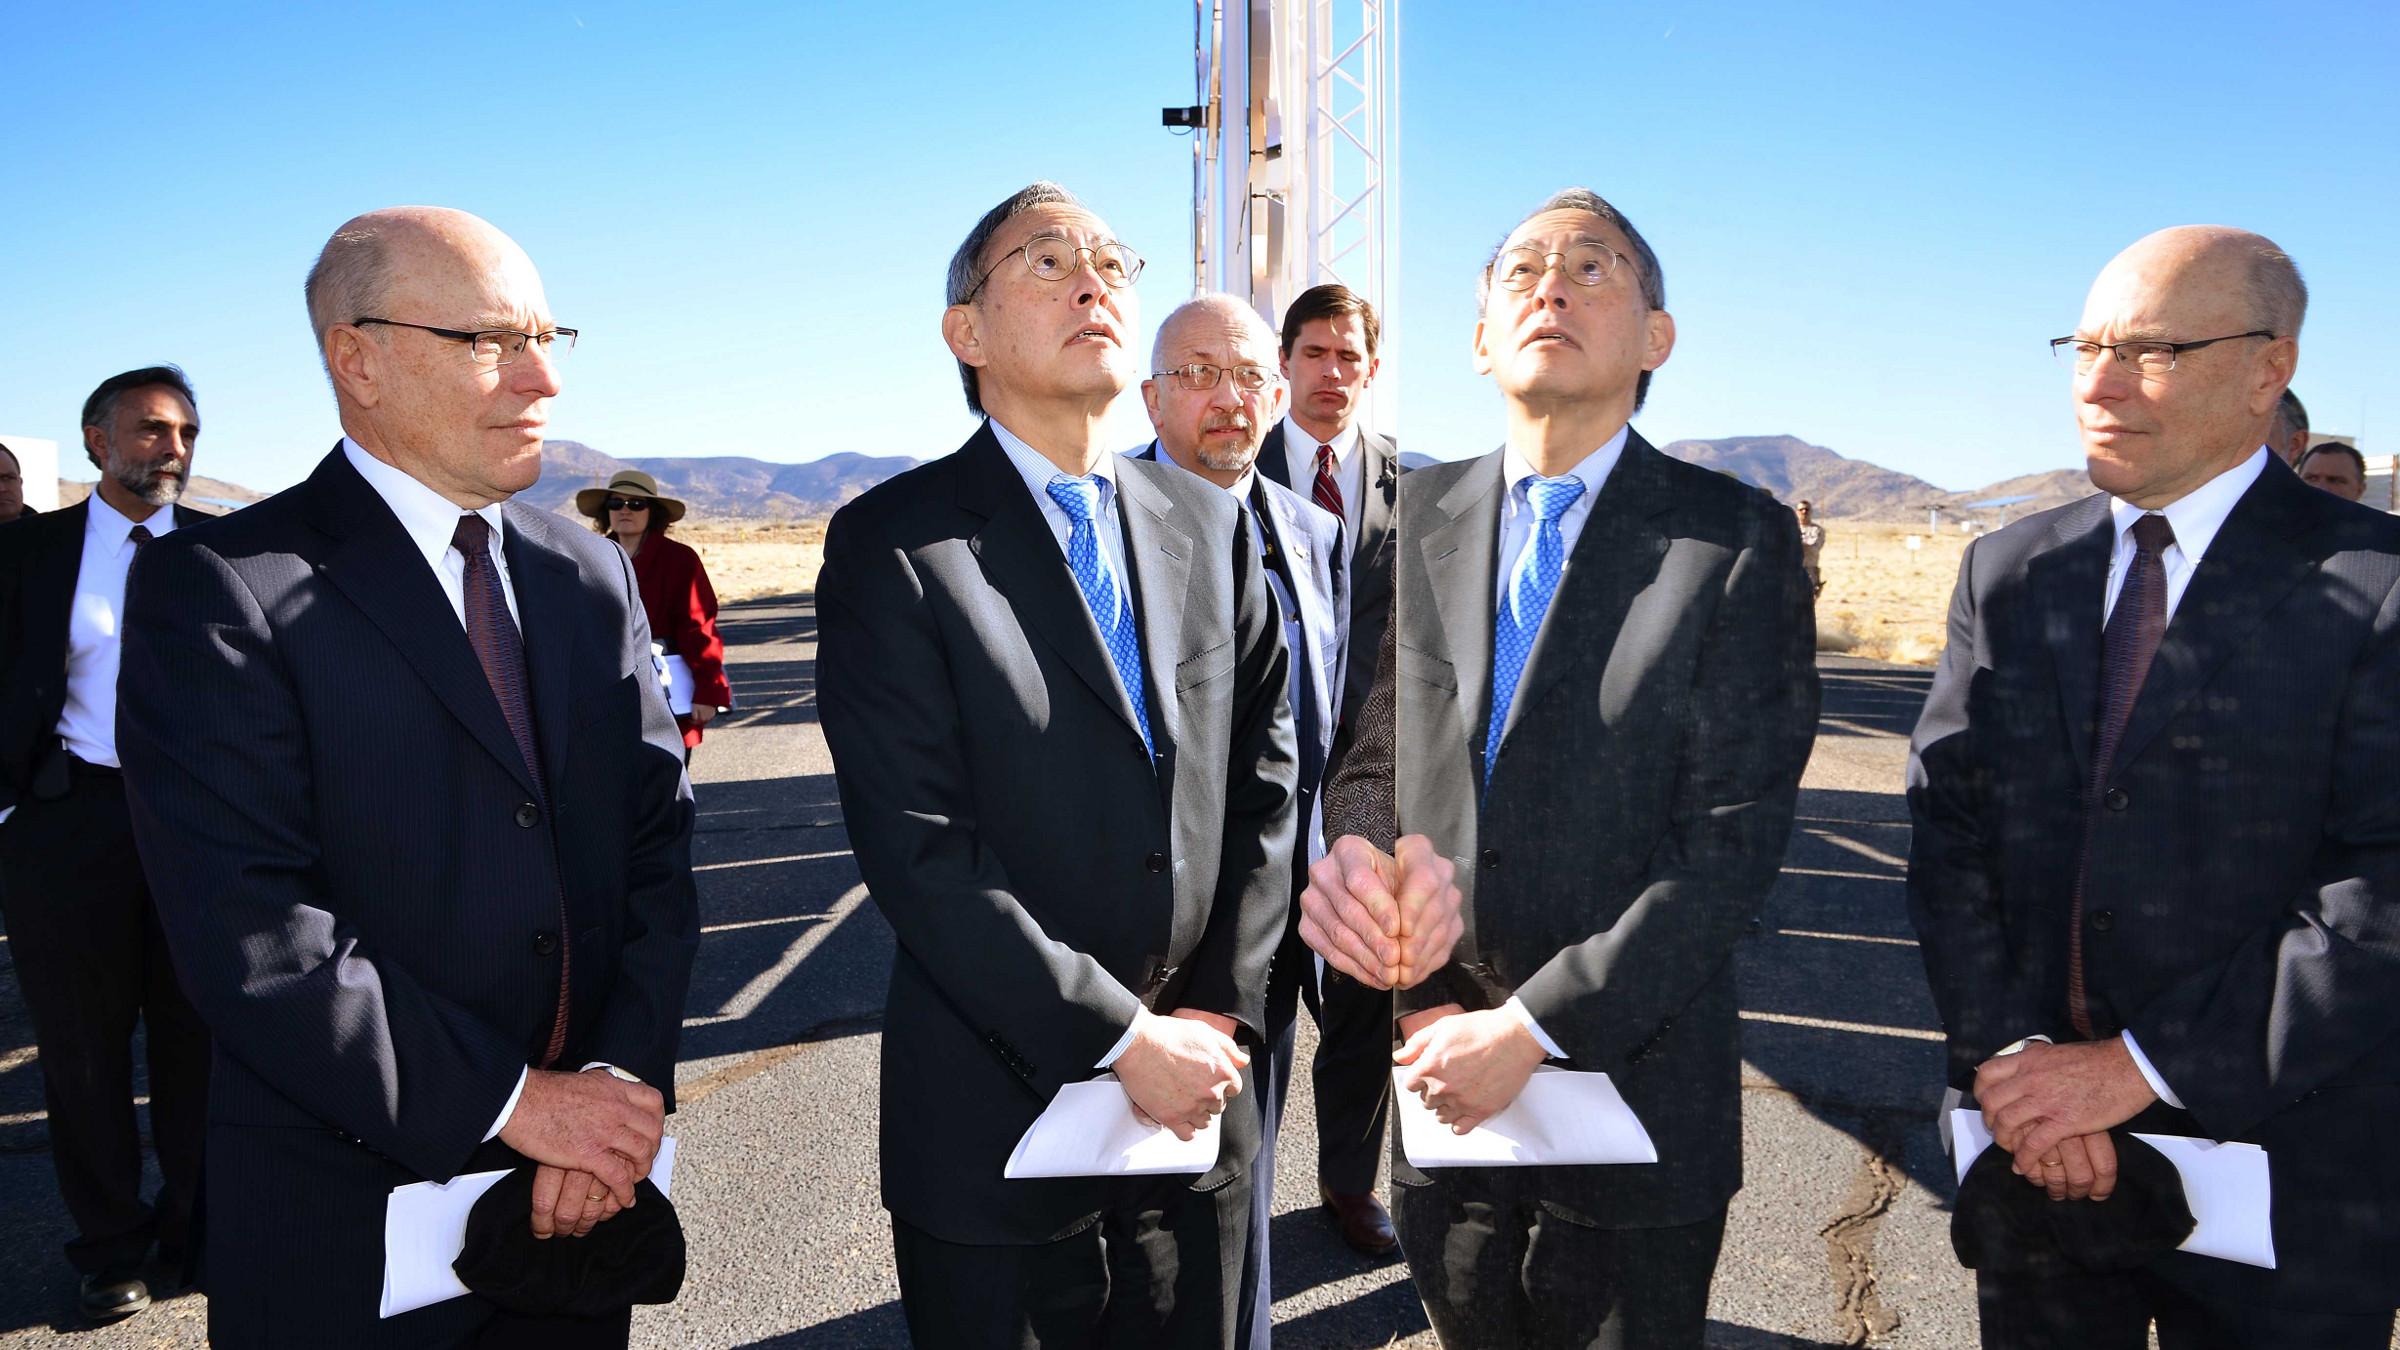 Reflecting on the legacy of US Energy Secretary Steven Chu.